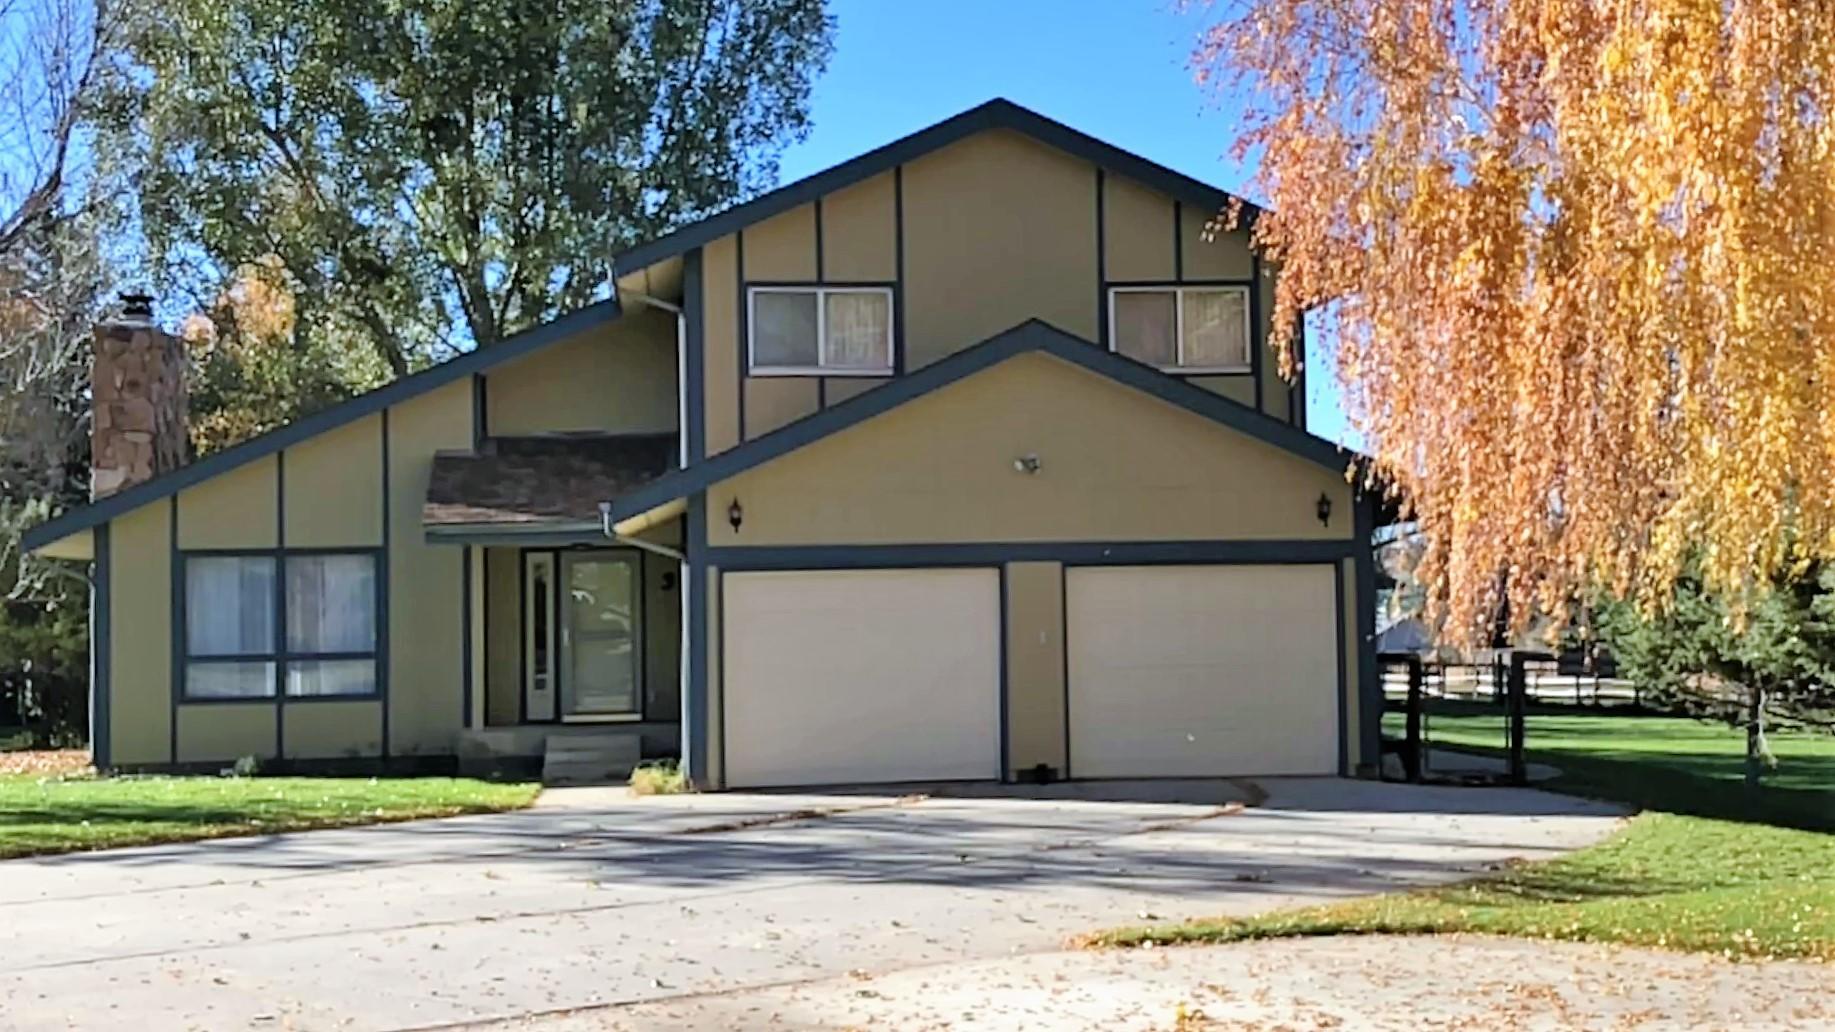 3 Kleiber Drive, Dayton, Wyoming 82836, 3 Bedrooms Bedrooms, ,2.5 BathroomsBathrooms,Residential,For Sale,Kleiber,18-1118